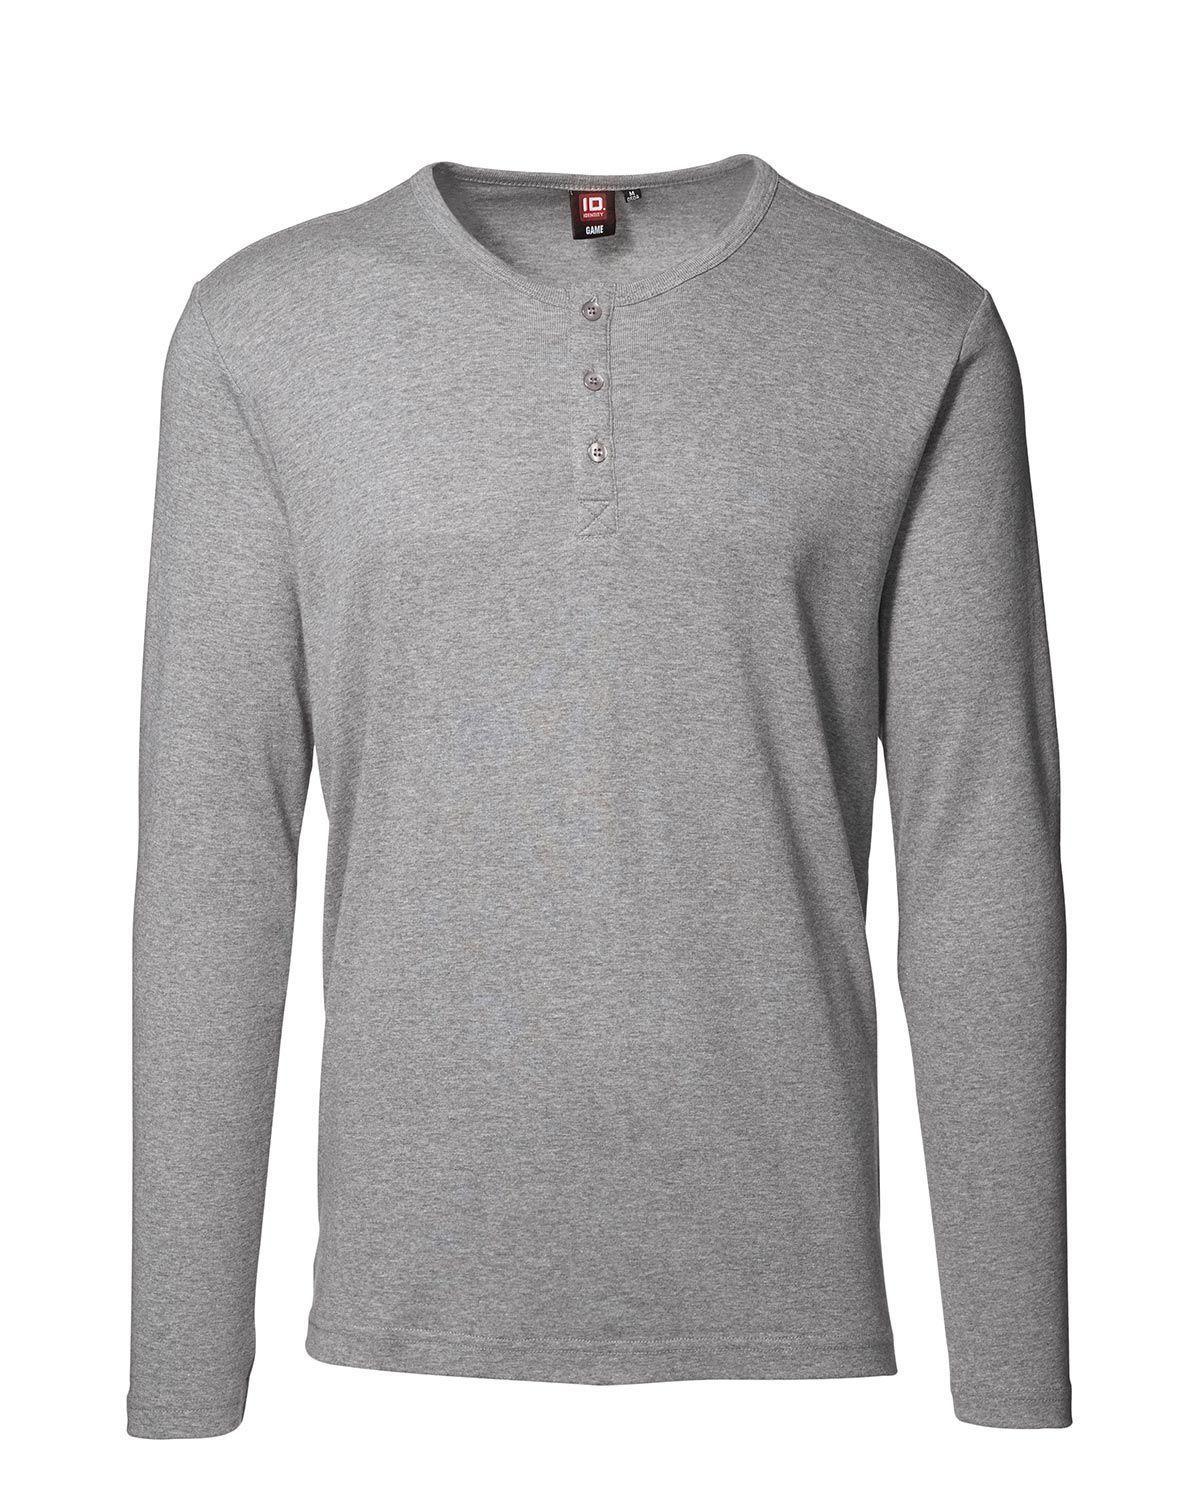 Køb ID Granddad T shirt | Fri Fragt over 600 |ARMY STAR